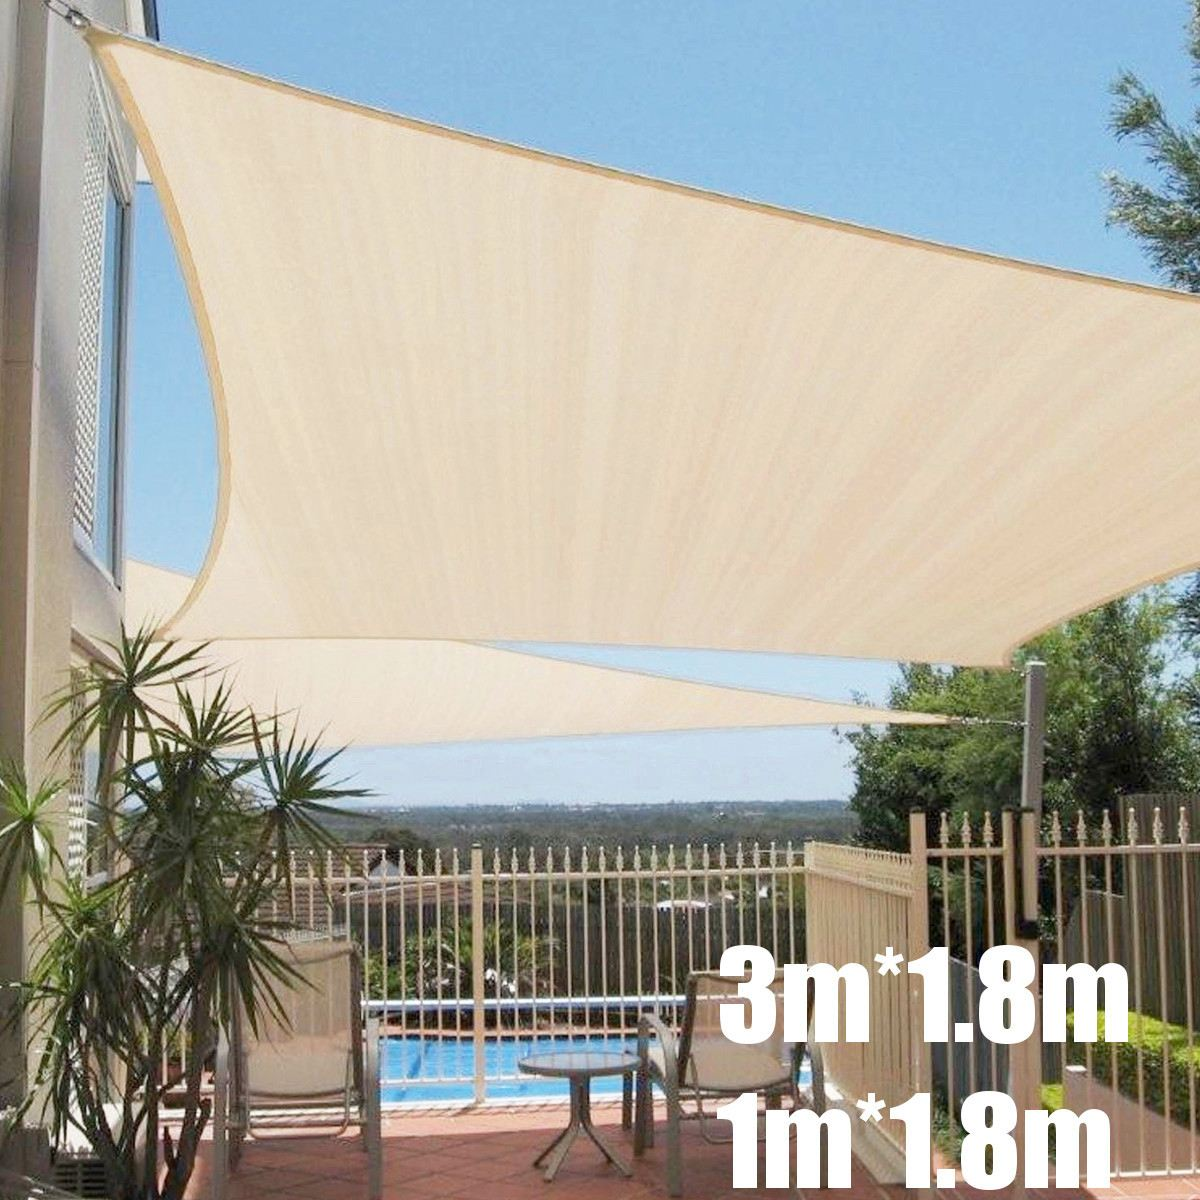 Sun Shelter Tent Beach Sunshade Net Outdoor Camping Garden UV Protect Canopy Patio Pool Shade Sail Awning Tent Portable 3*1.8m herramientas para el aseo de la casa